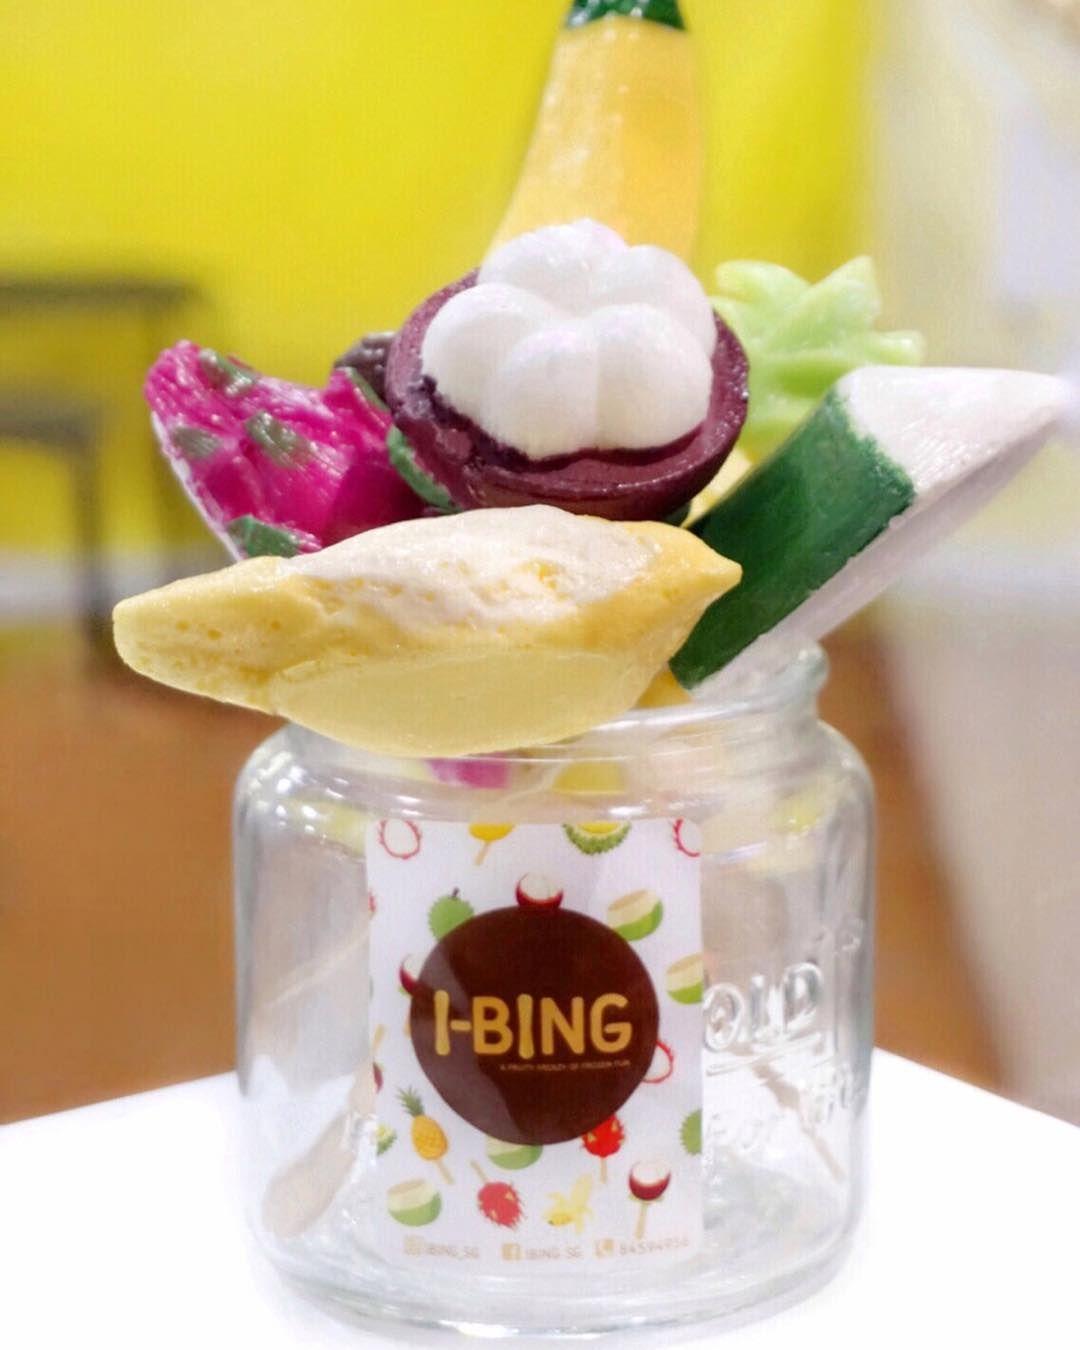 I-Bing - Fruit Ice-Cream